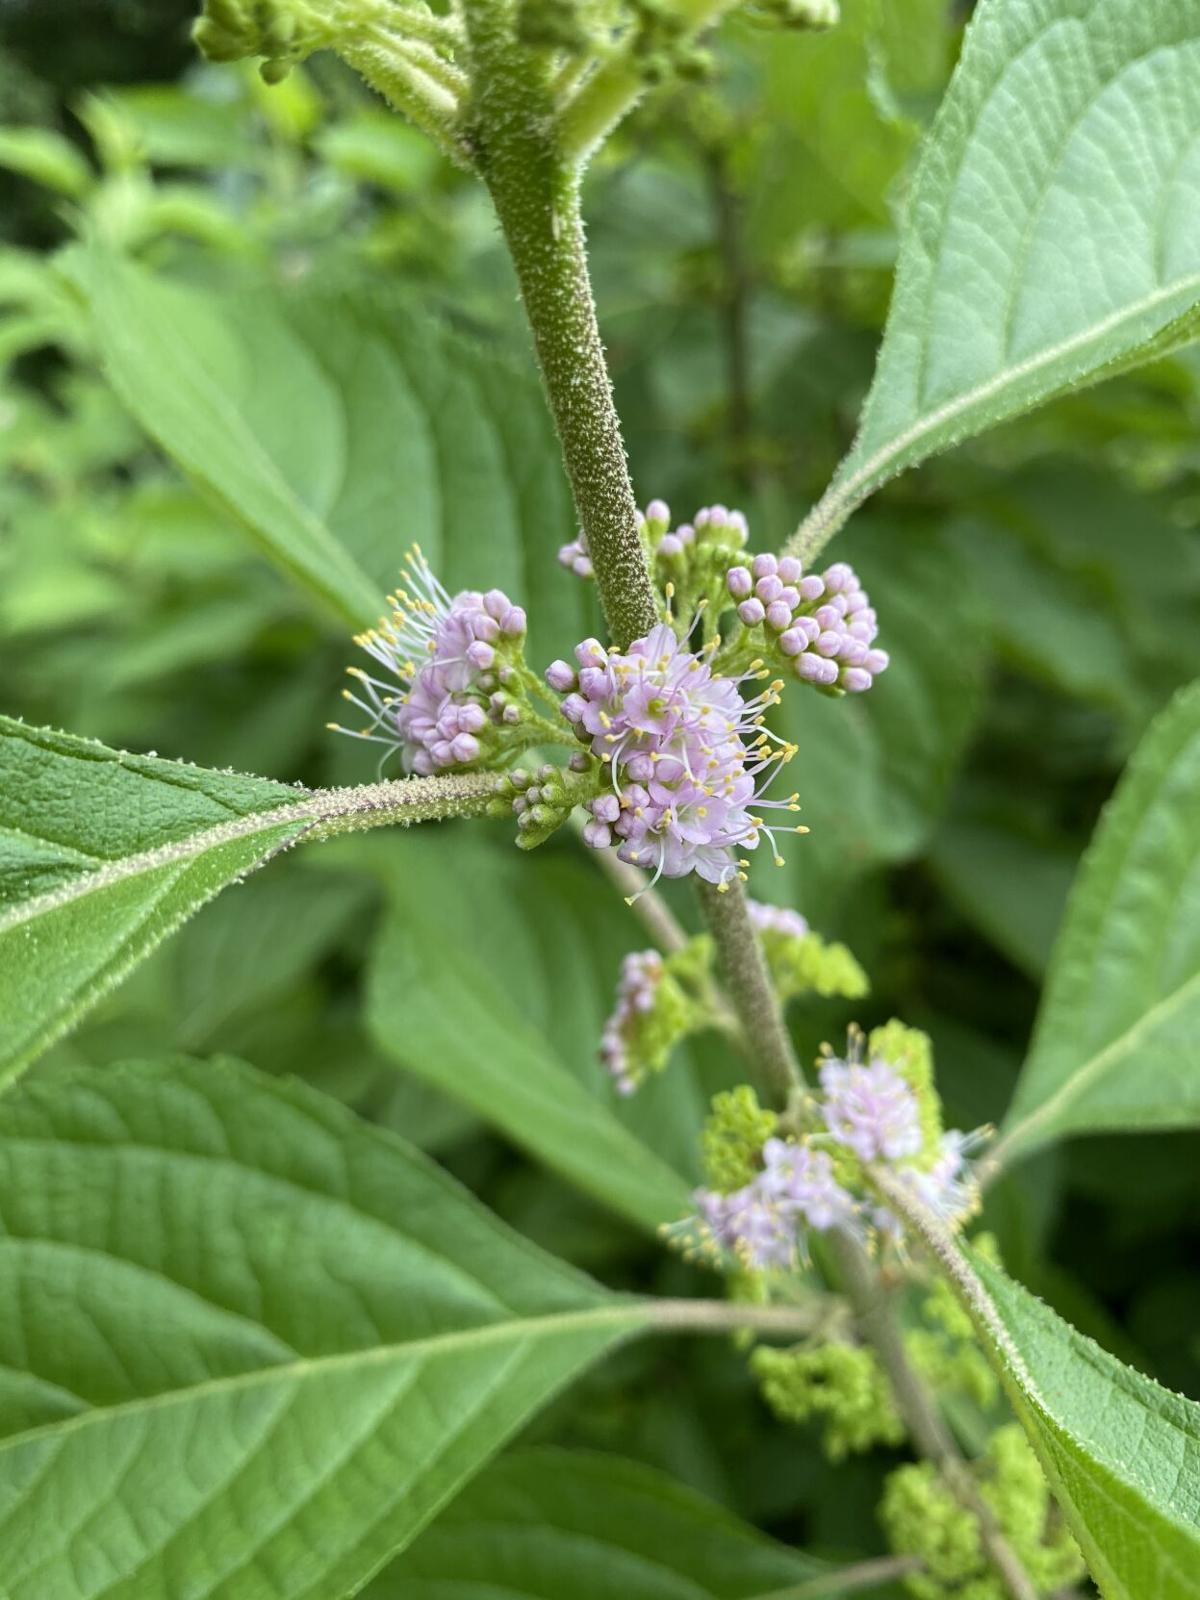 Callicarpa americana or beautyberry